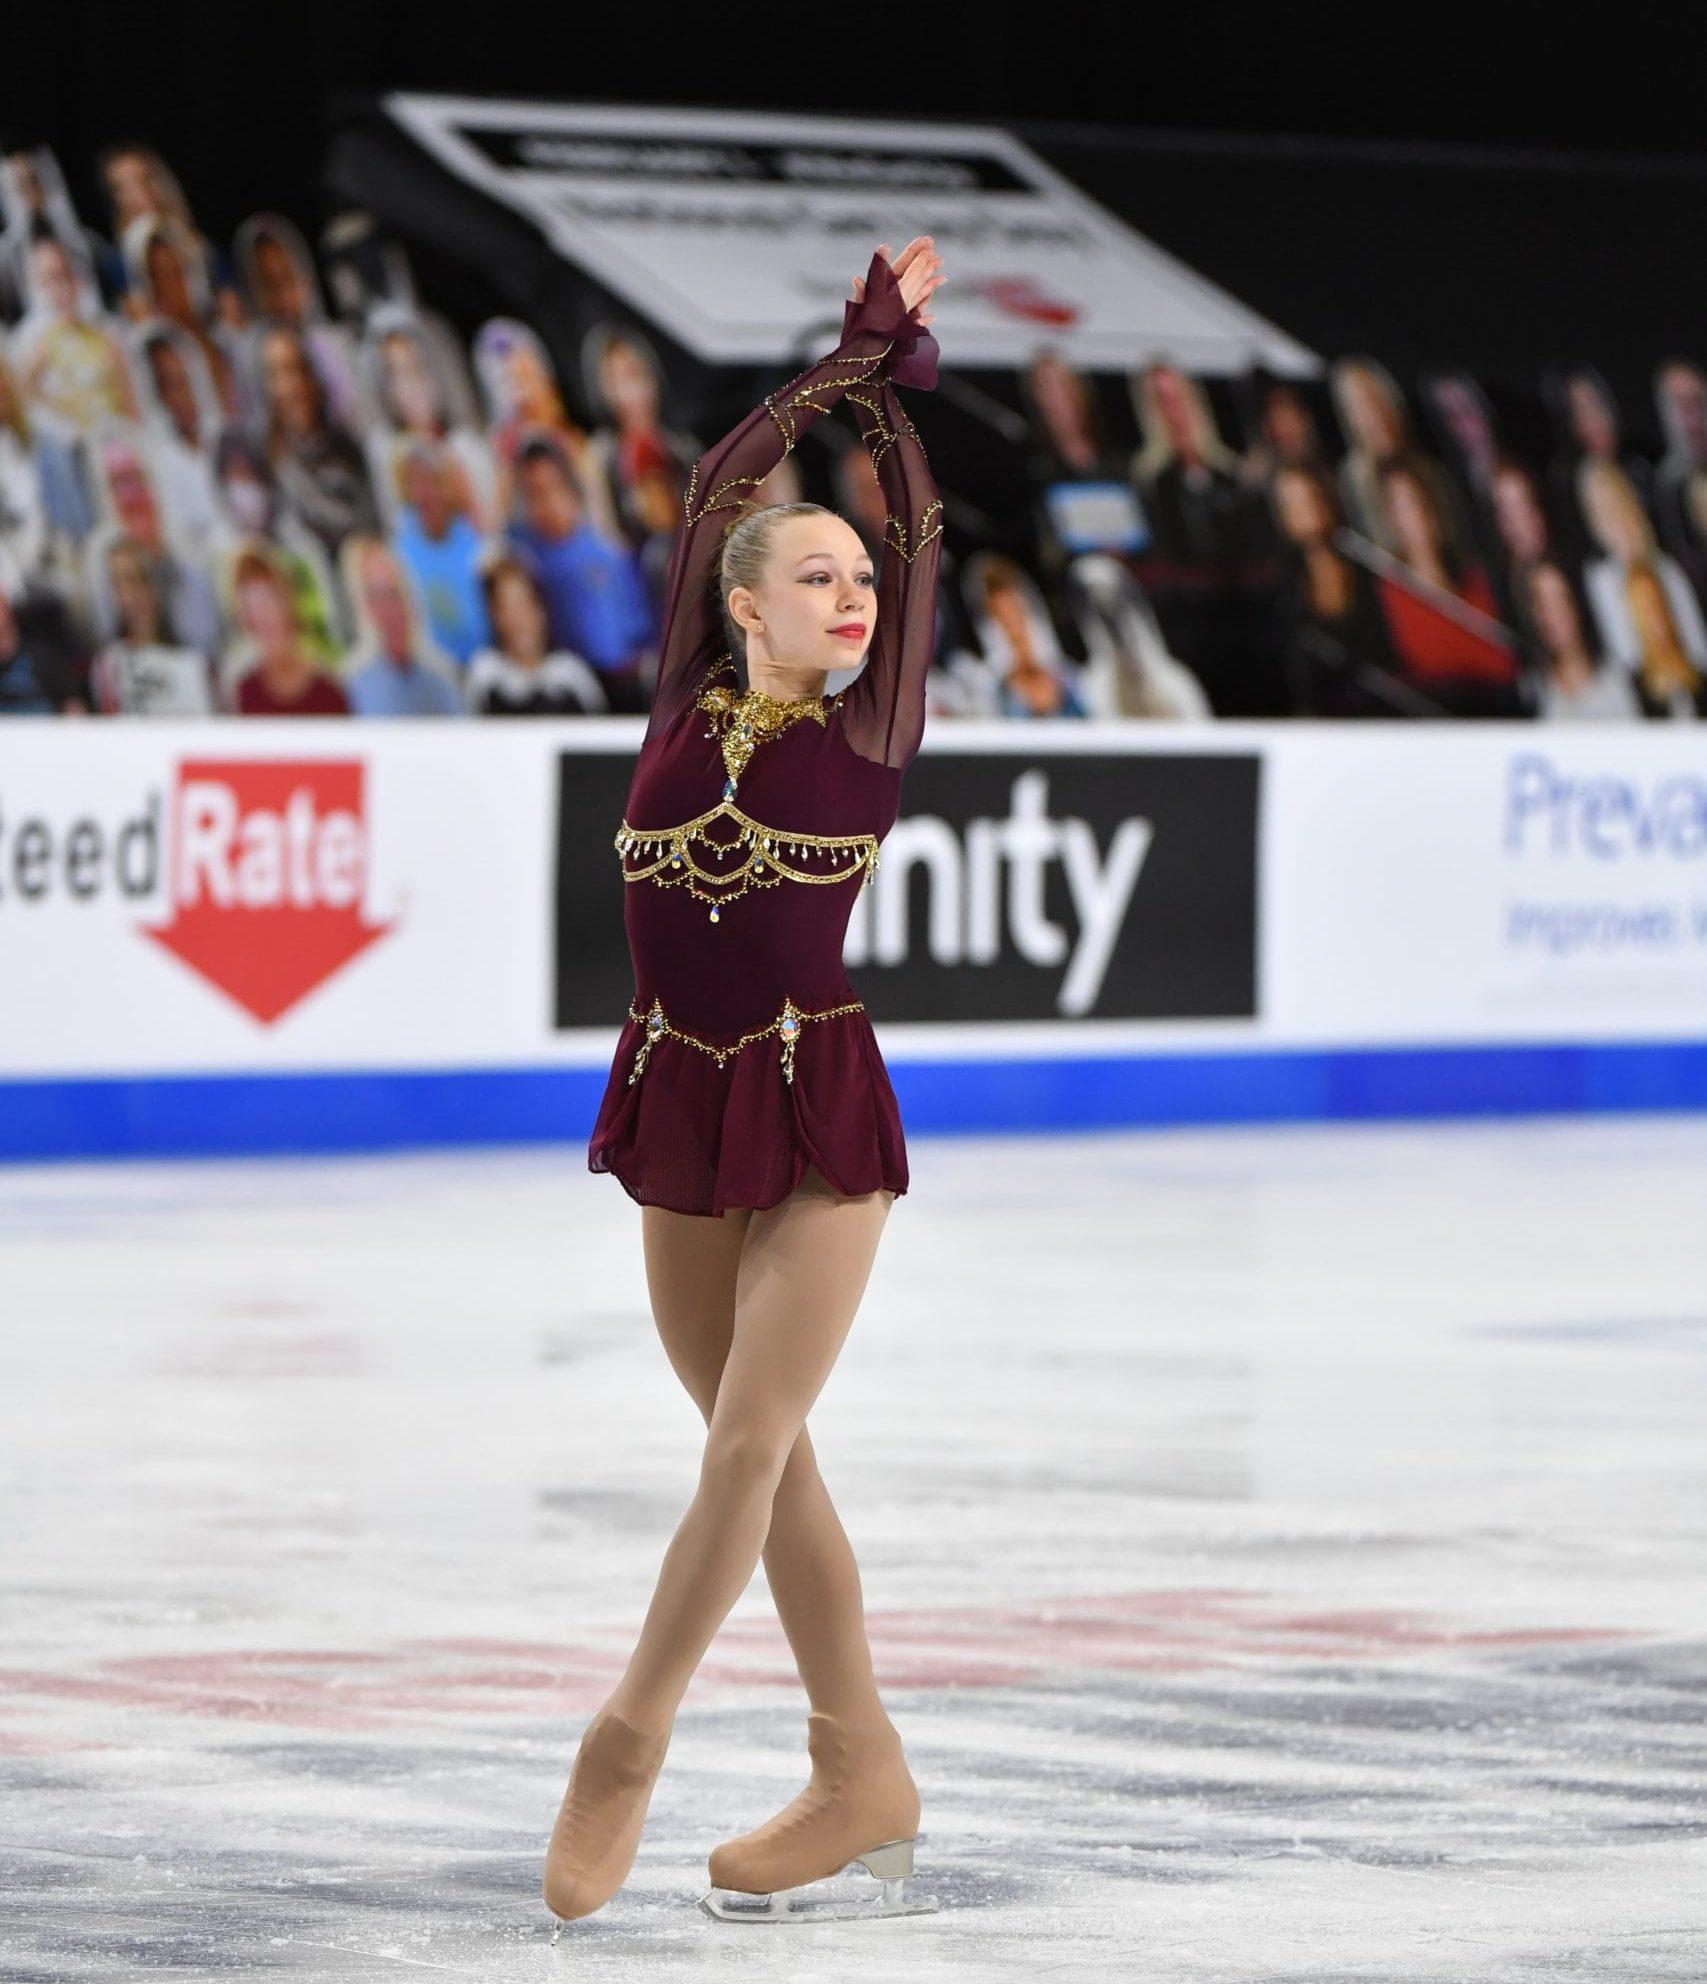 Lindsay Thorngren skates